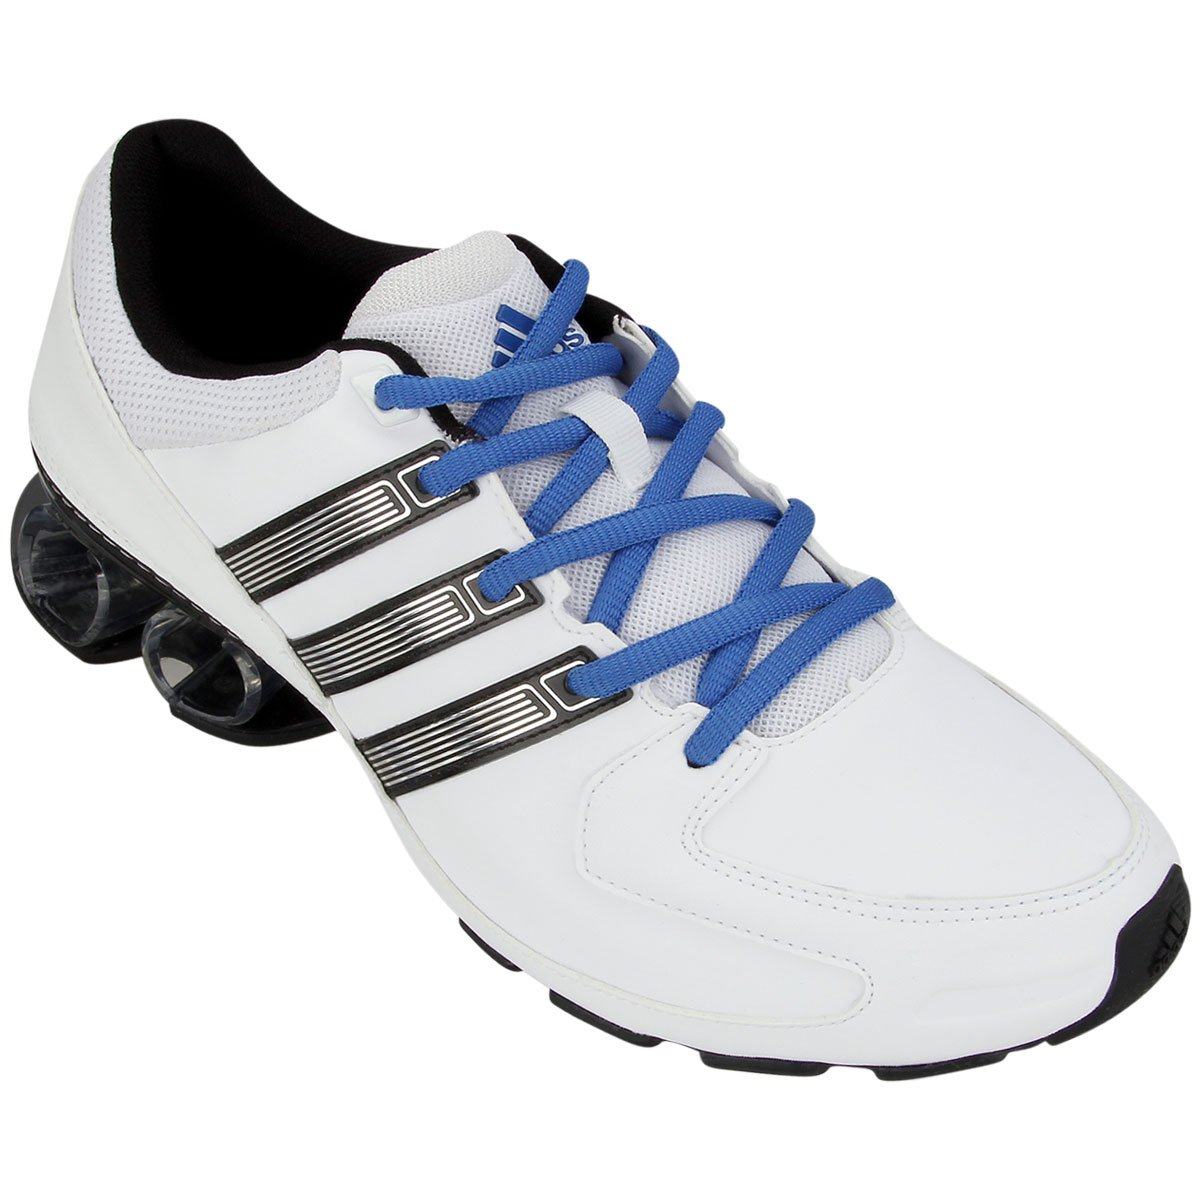 cfbd7a042f2 Tênis Adidas Komet Syn - Compre Agora